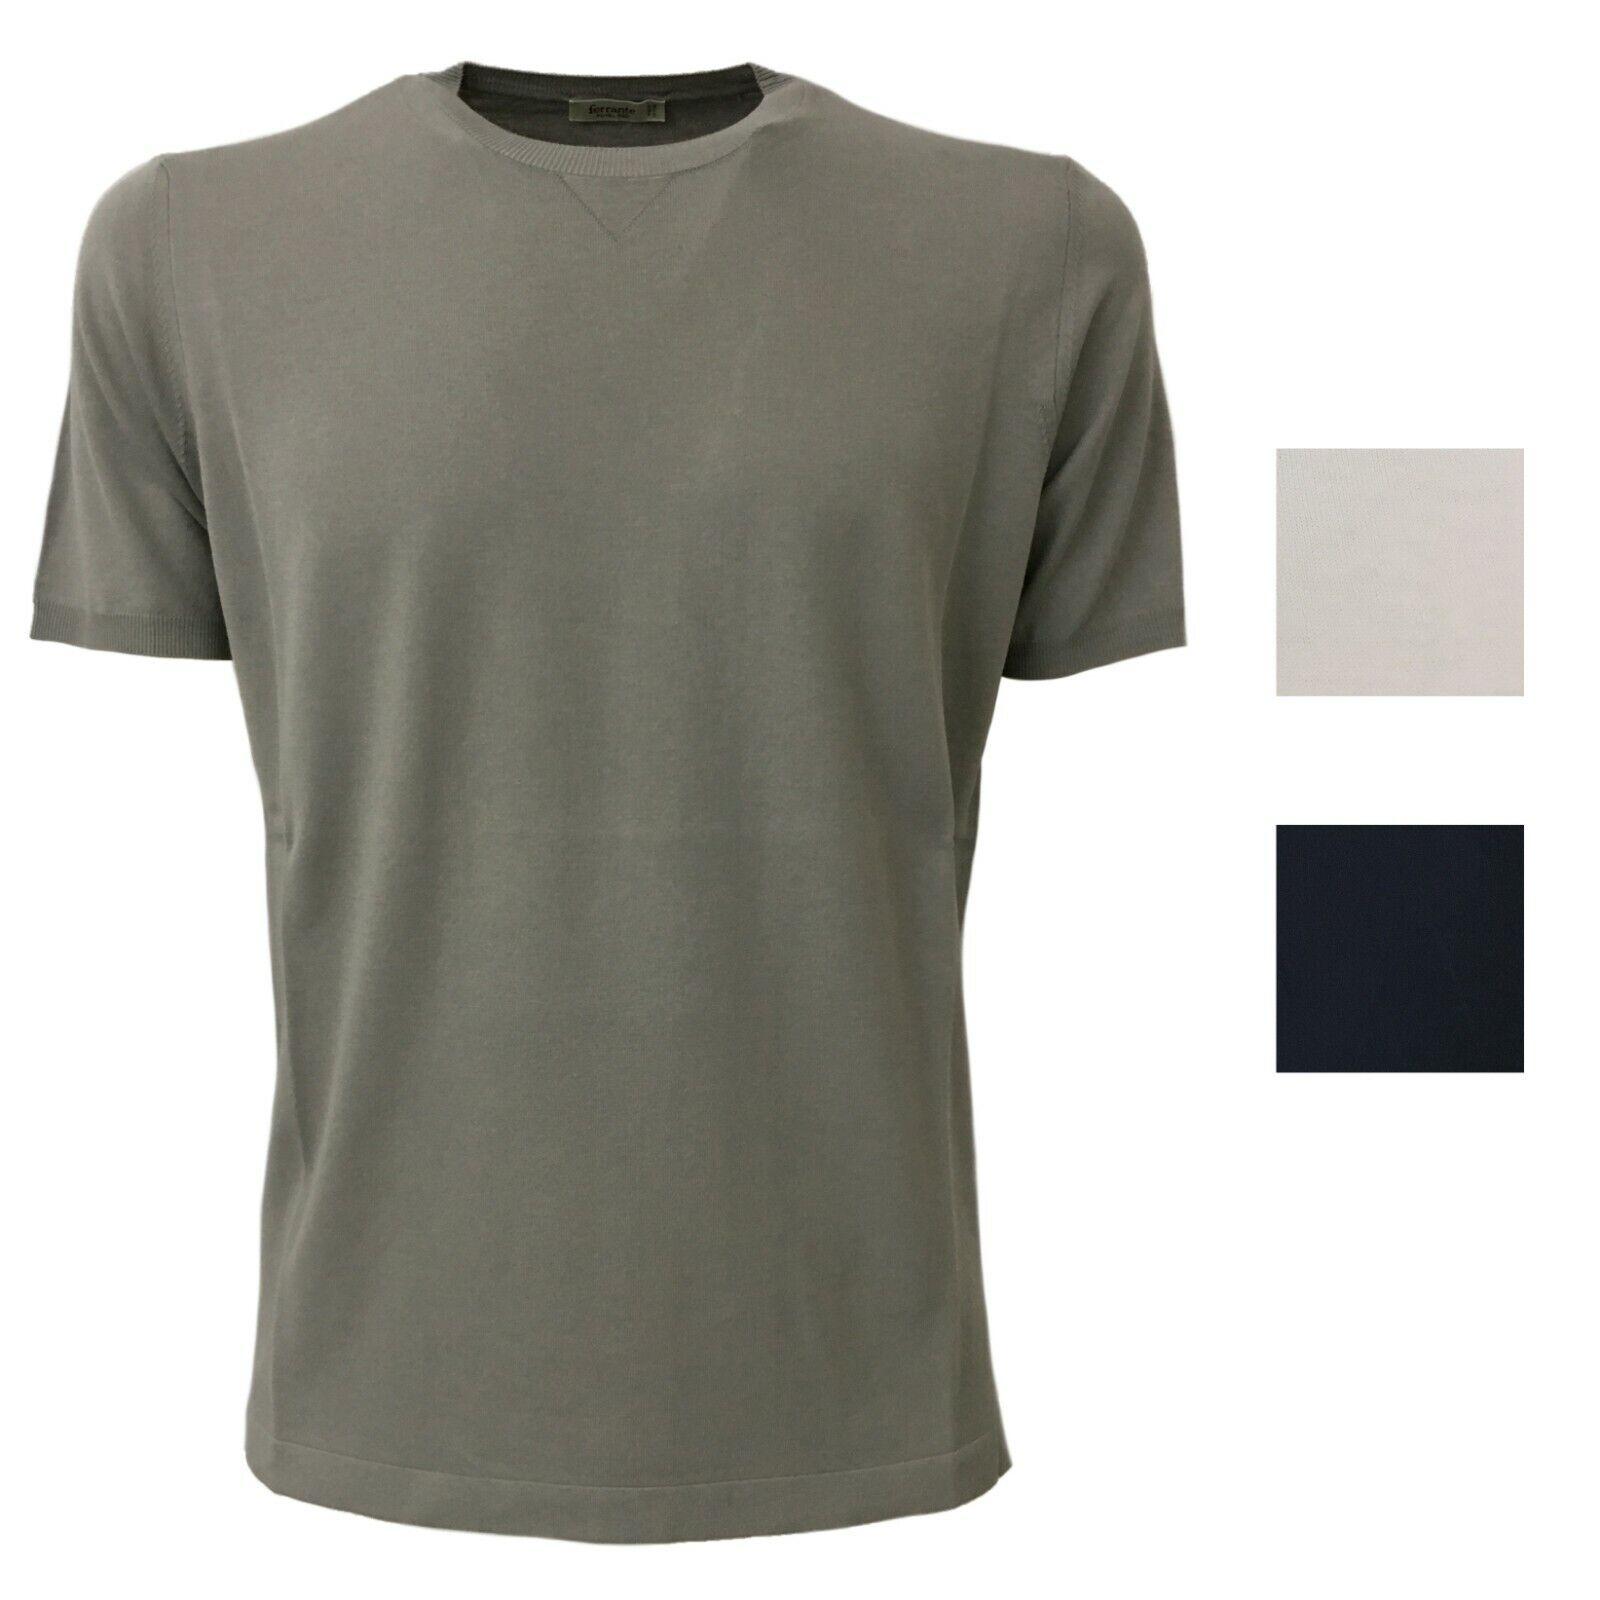 T-Shirt Herren Kurzarm FERRANTE100% Baumwolle Crepe Art 29106 Made in